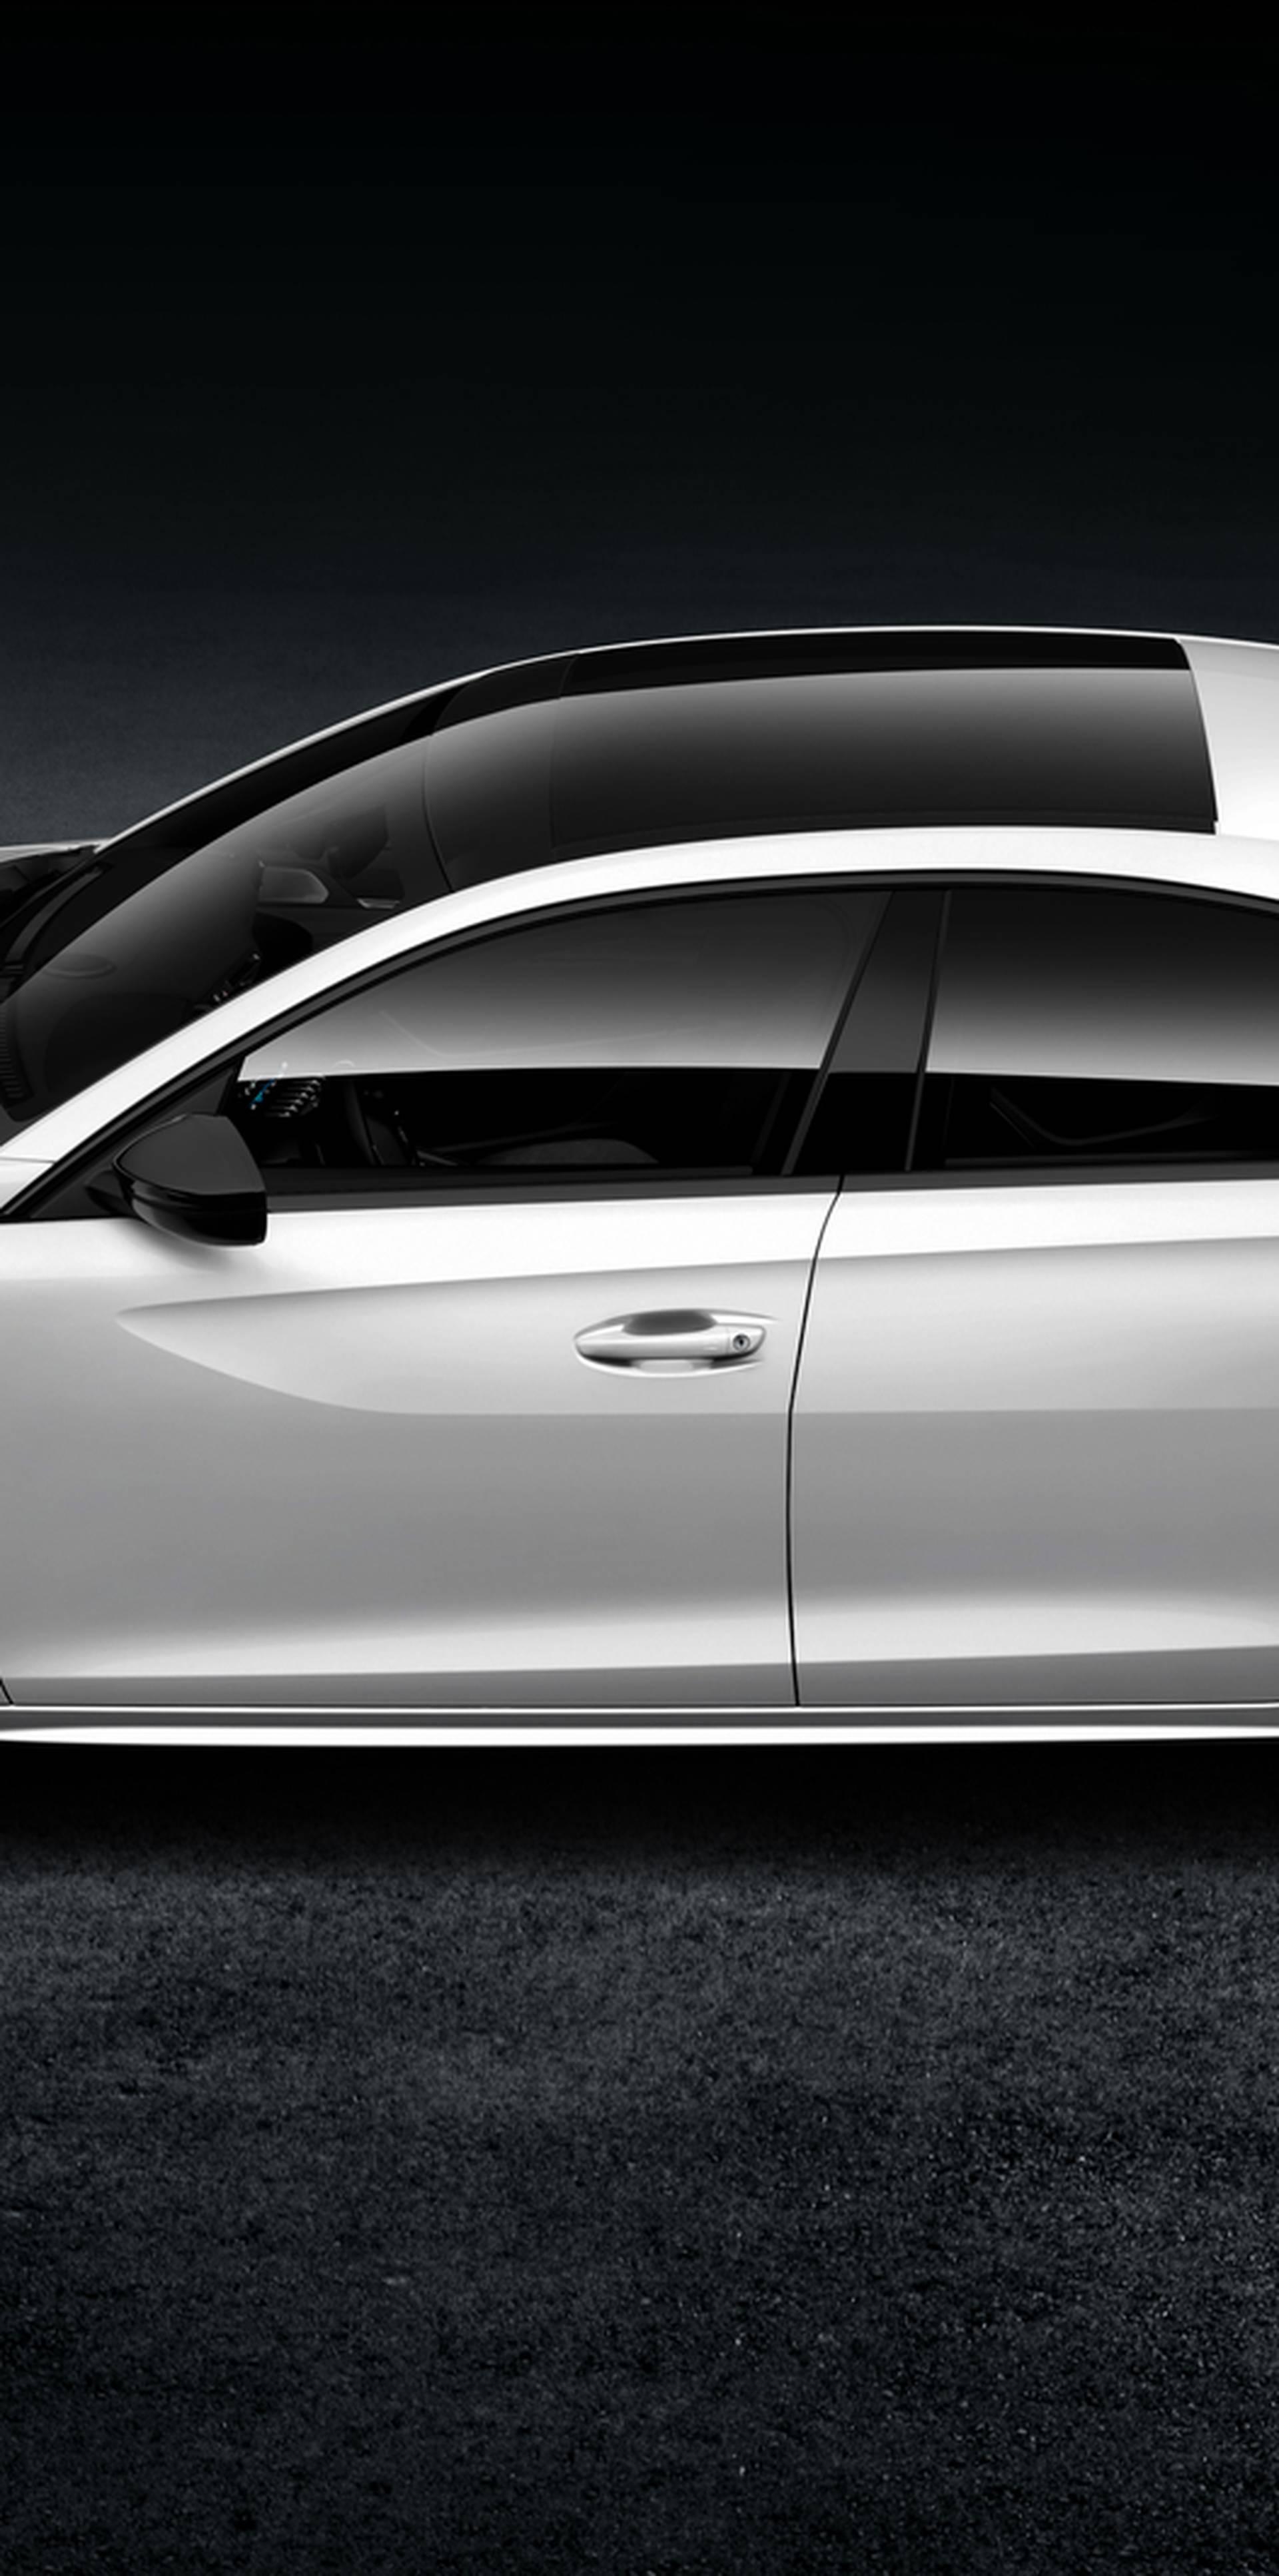 Novi Peugeot 508 sa stilom ide u napad na Passata i društvo